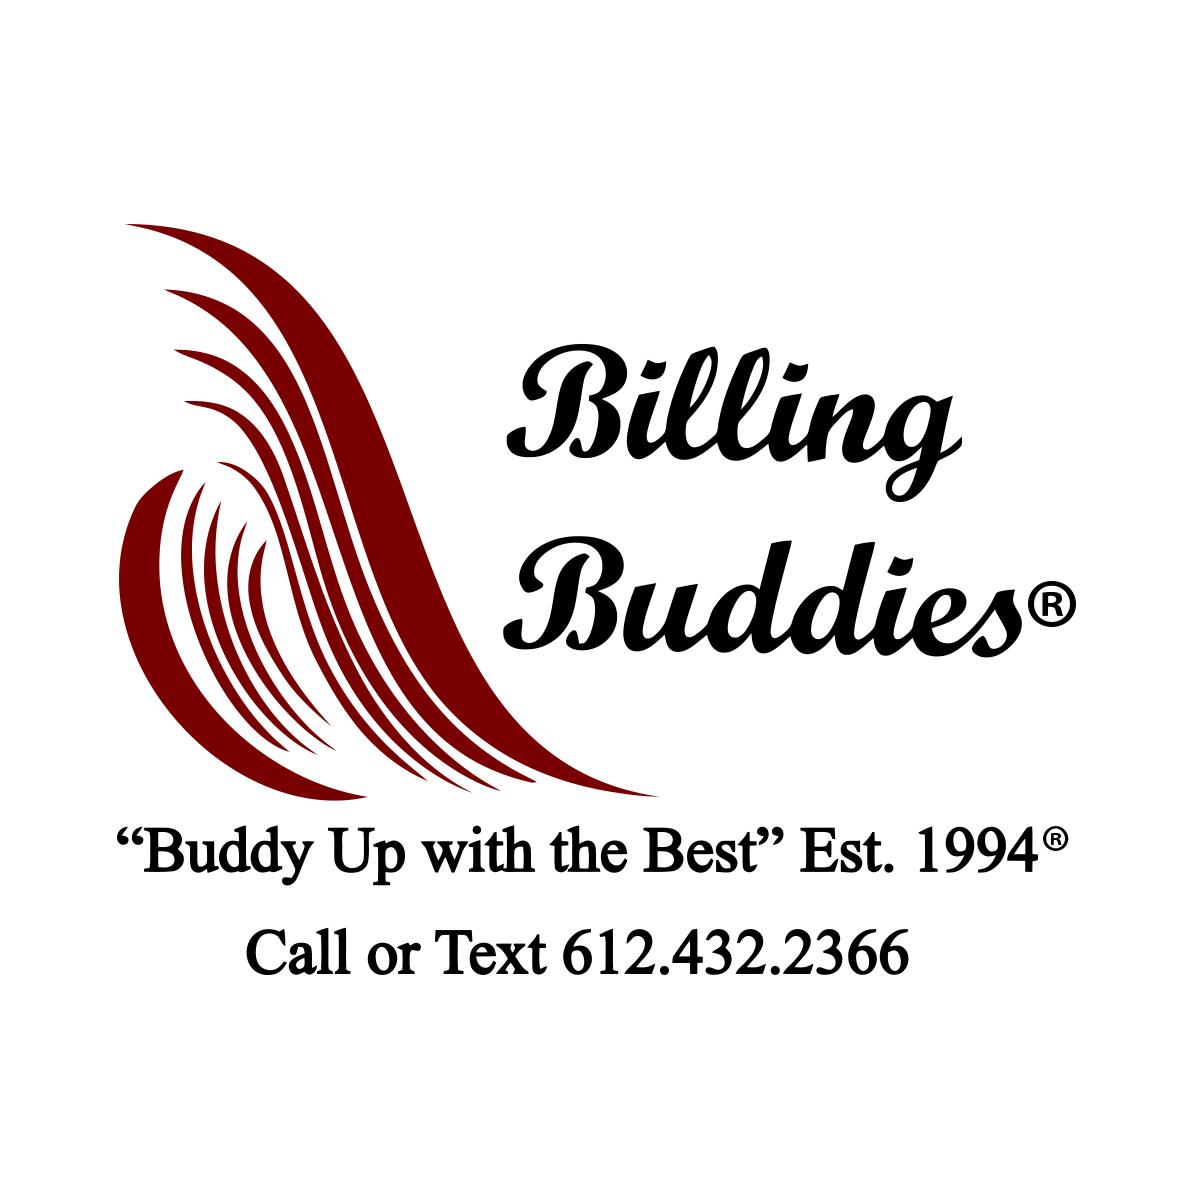 Billing Buddies